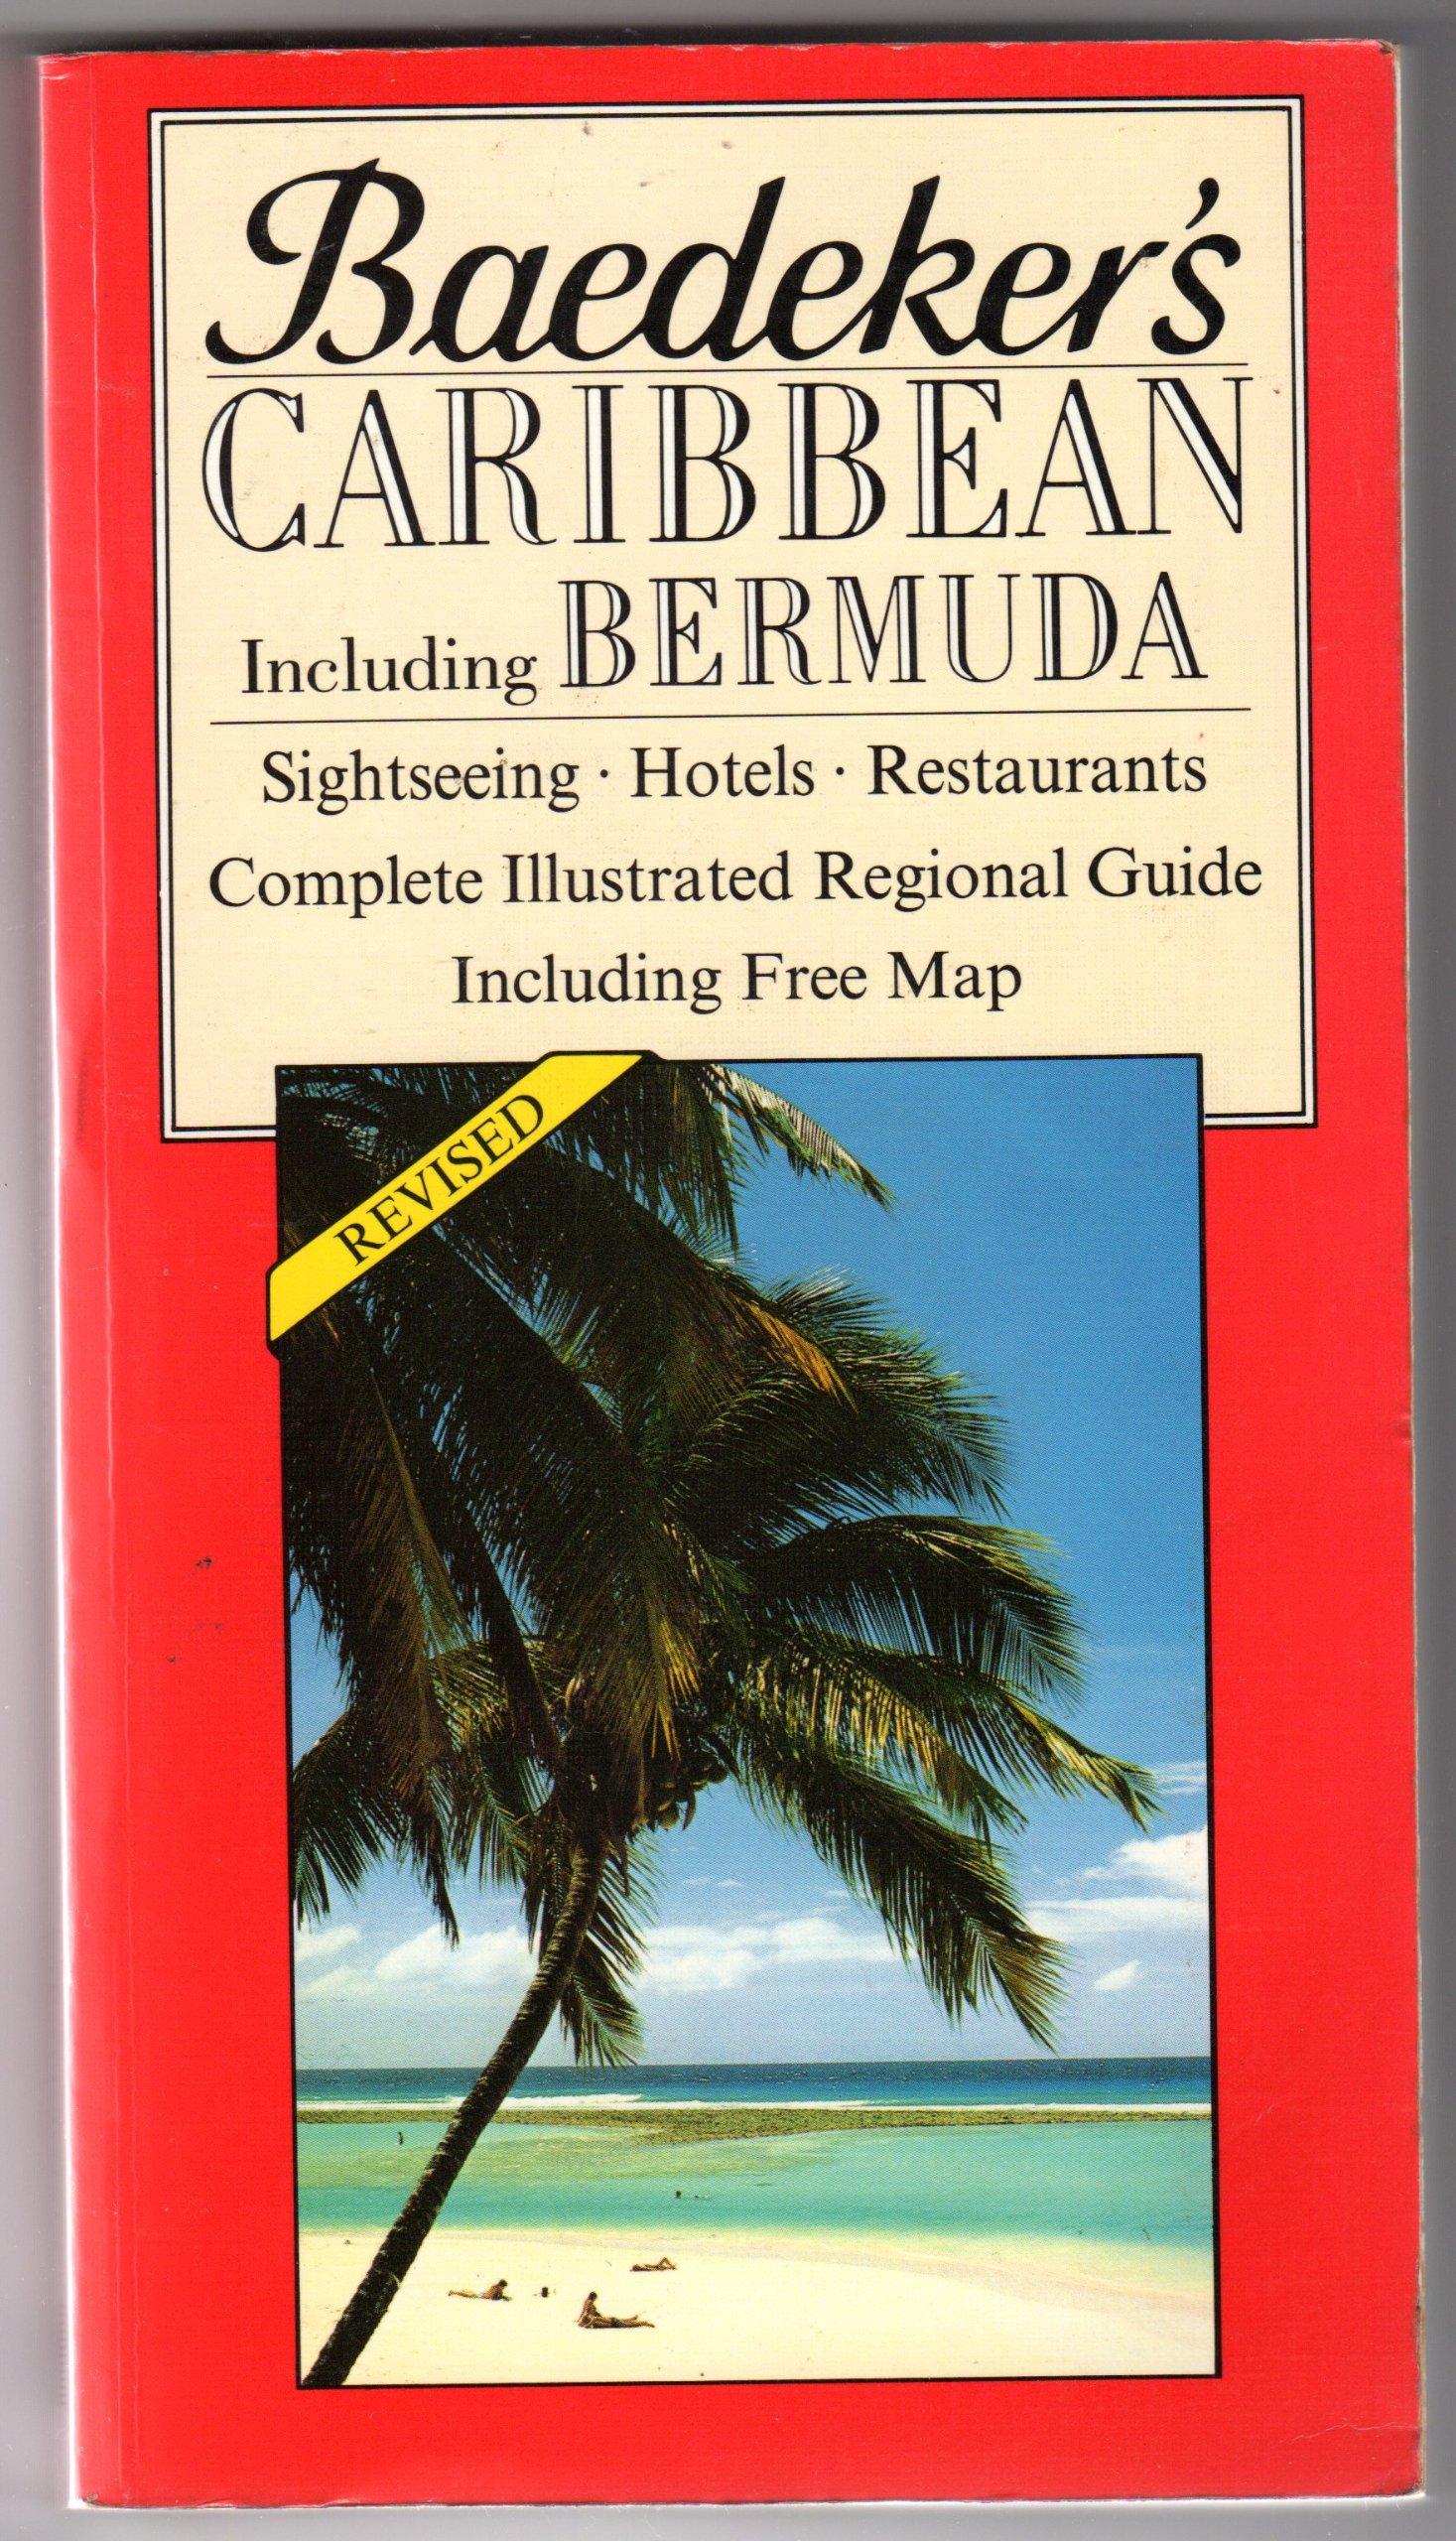 Baedeker's Caribbean including Bermuda (Baedeker guides)